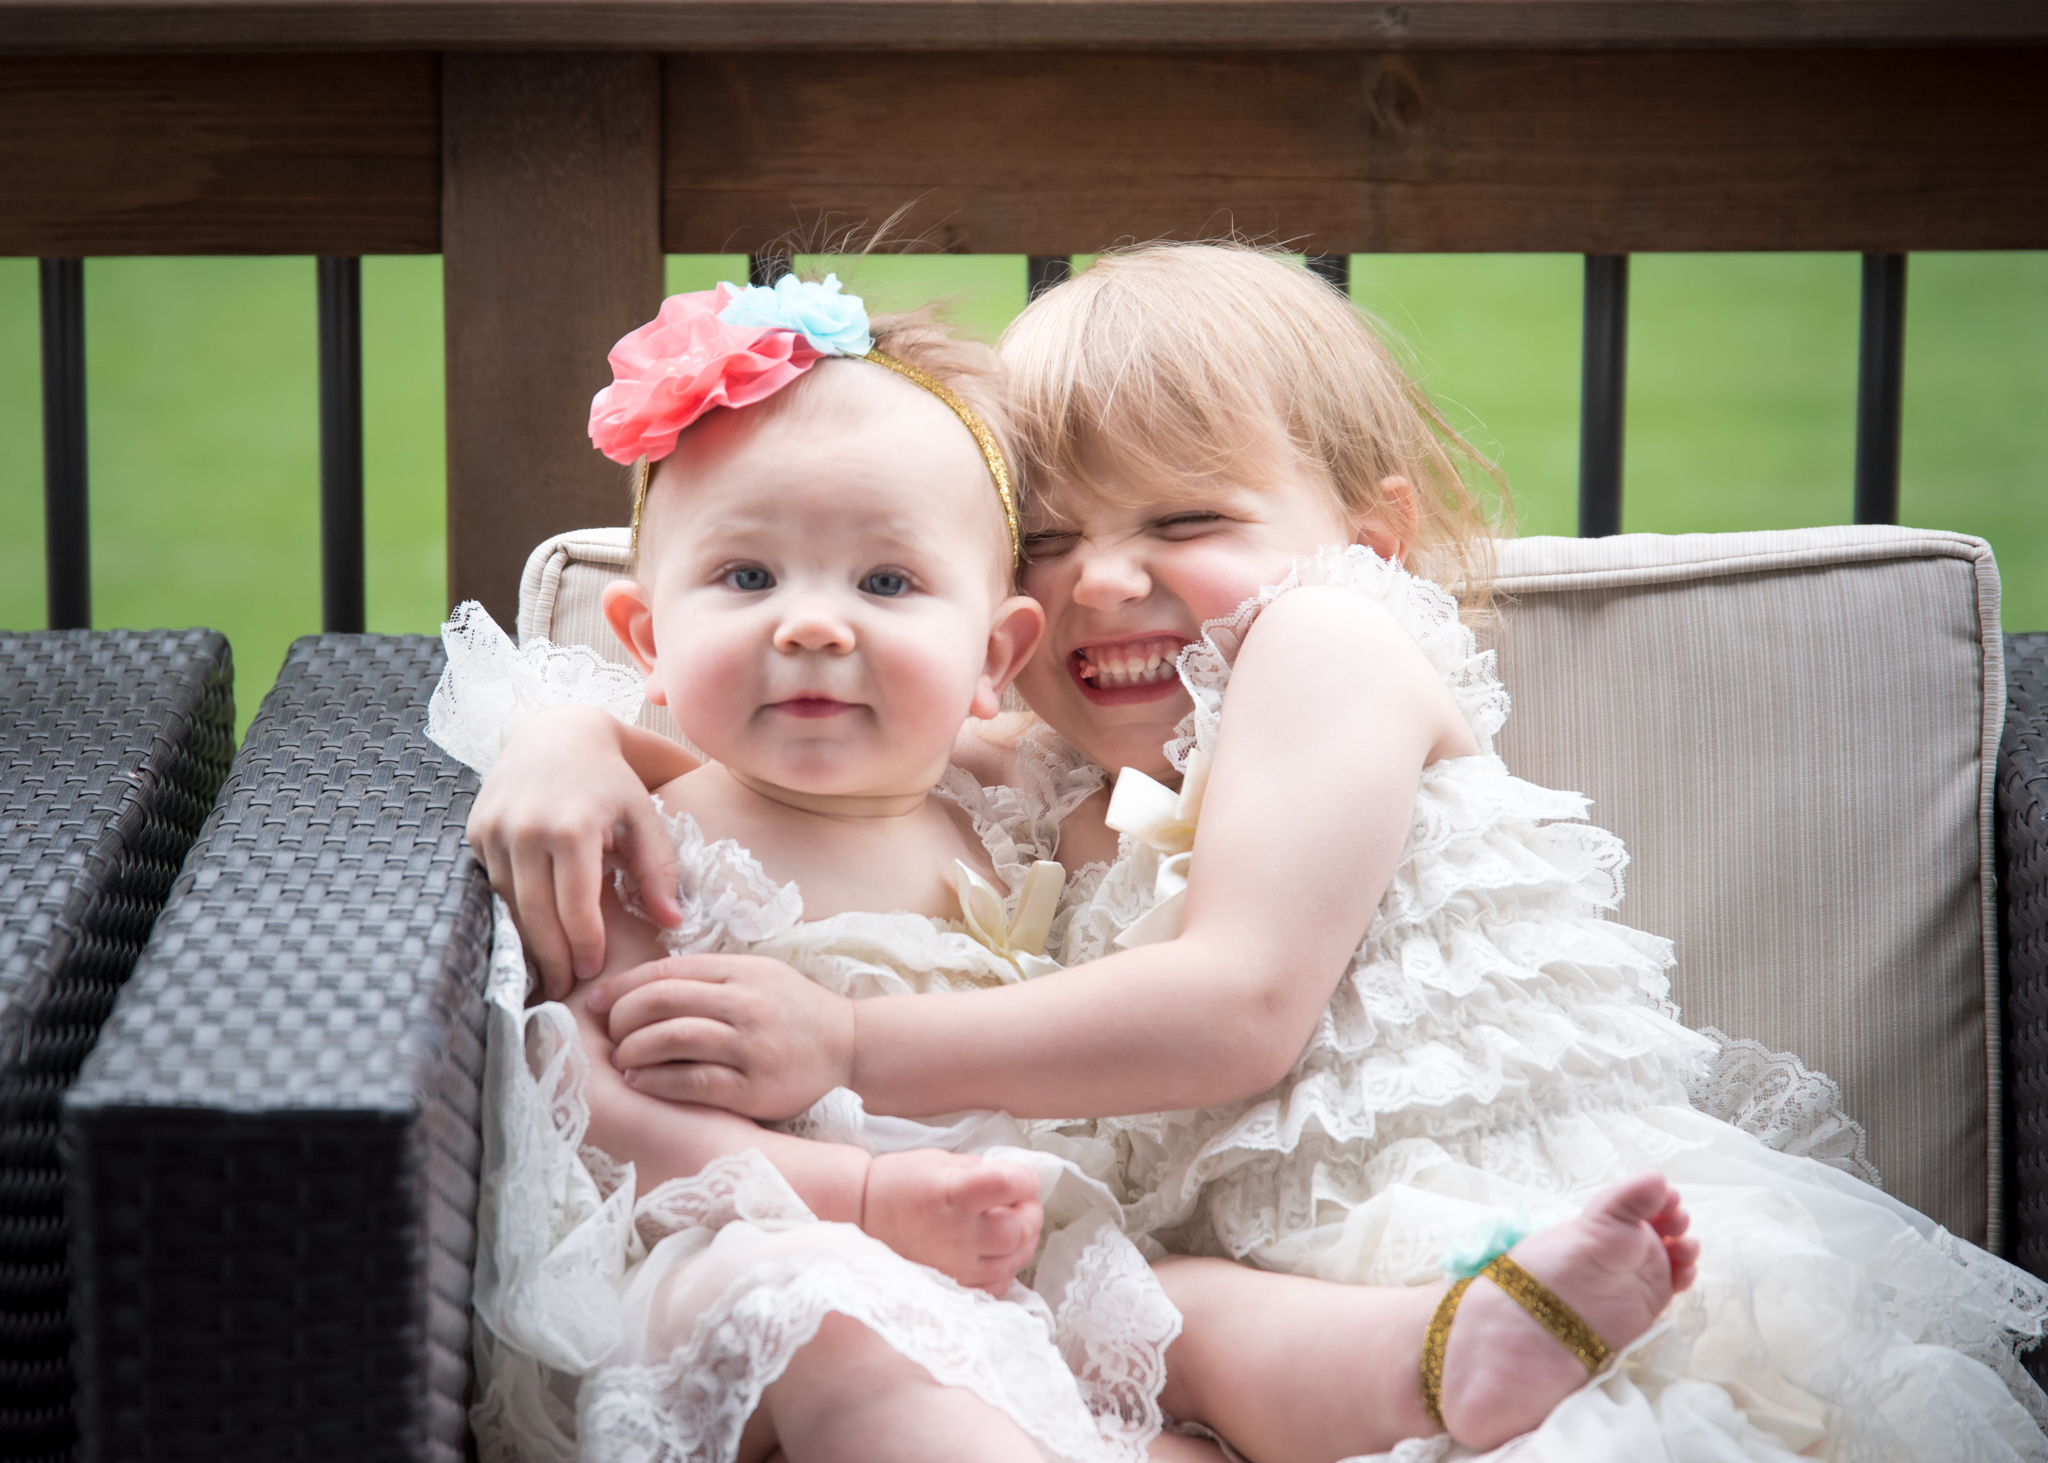 Two girl siblings hugging